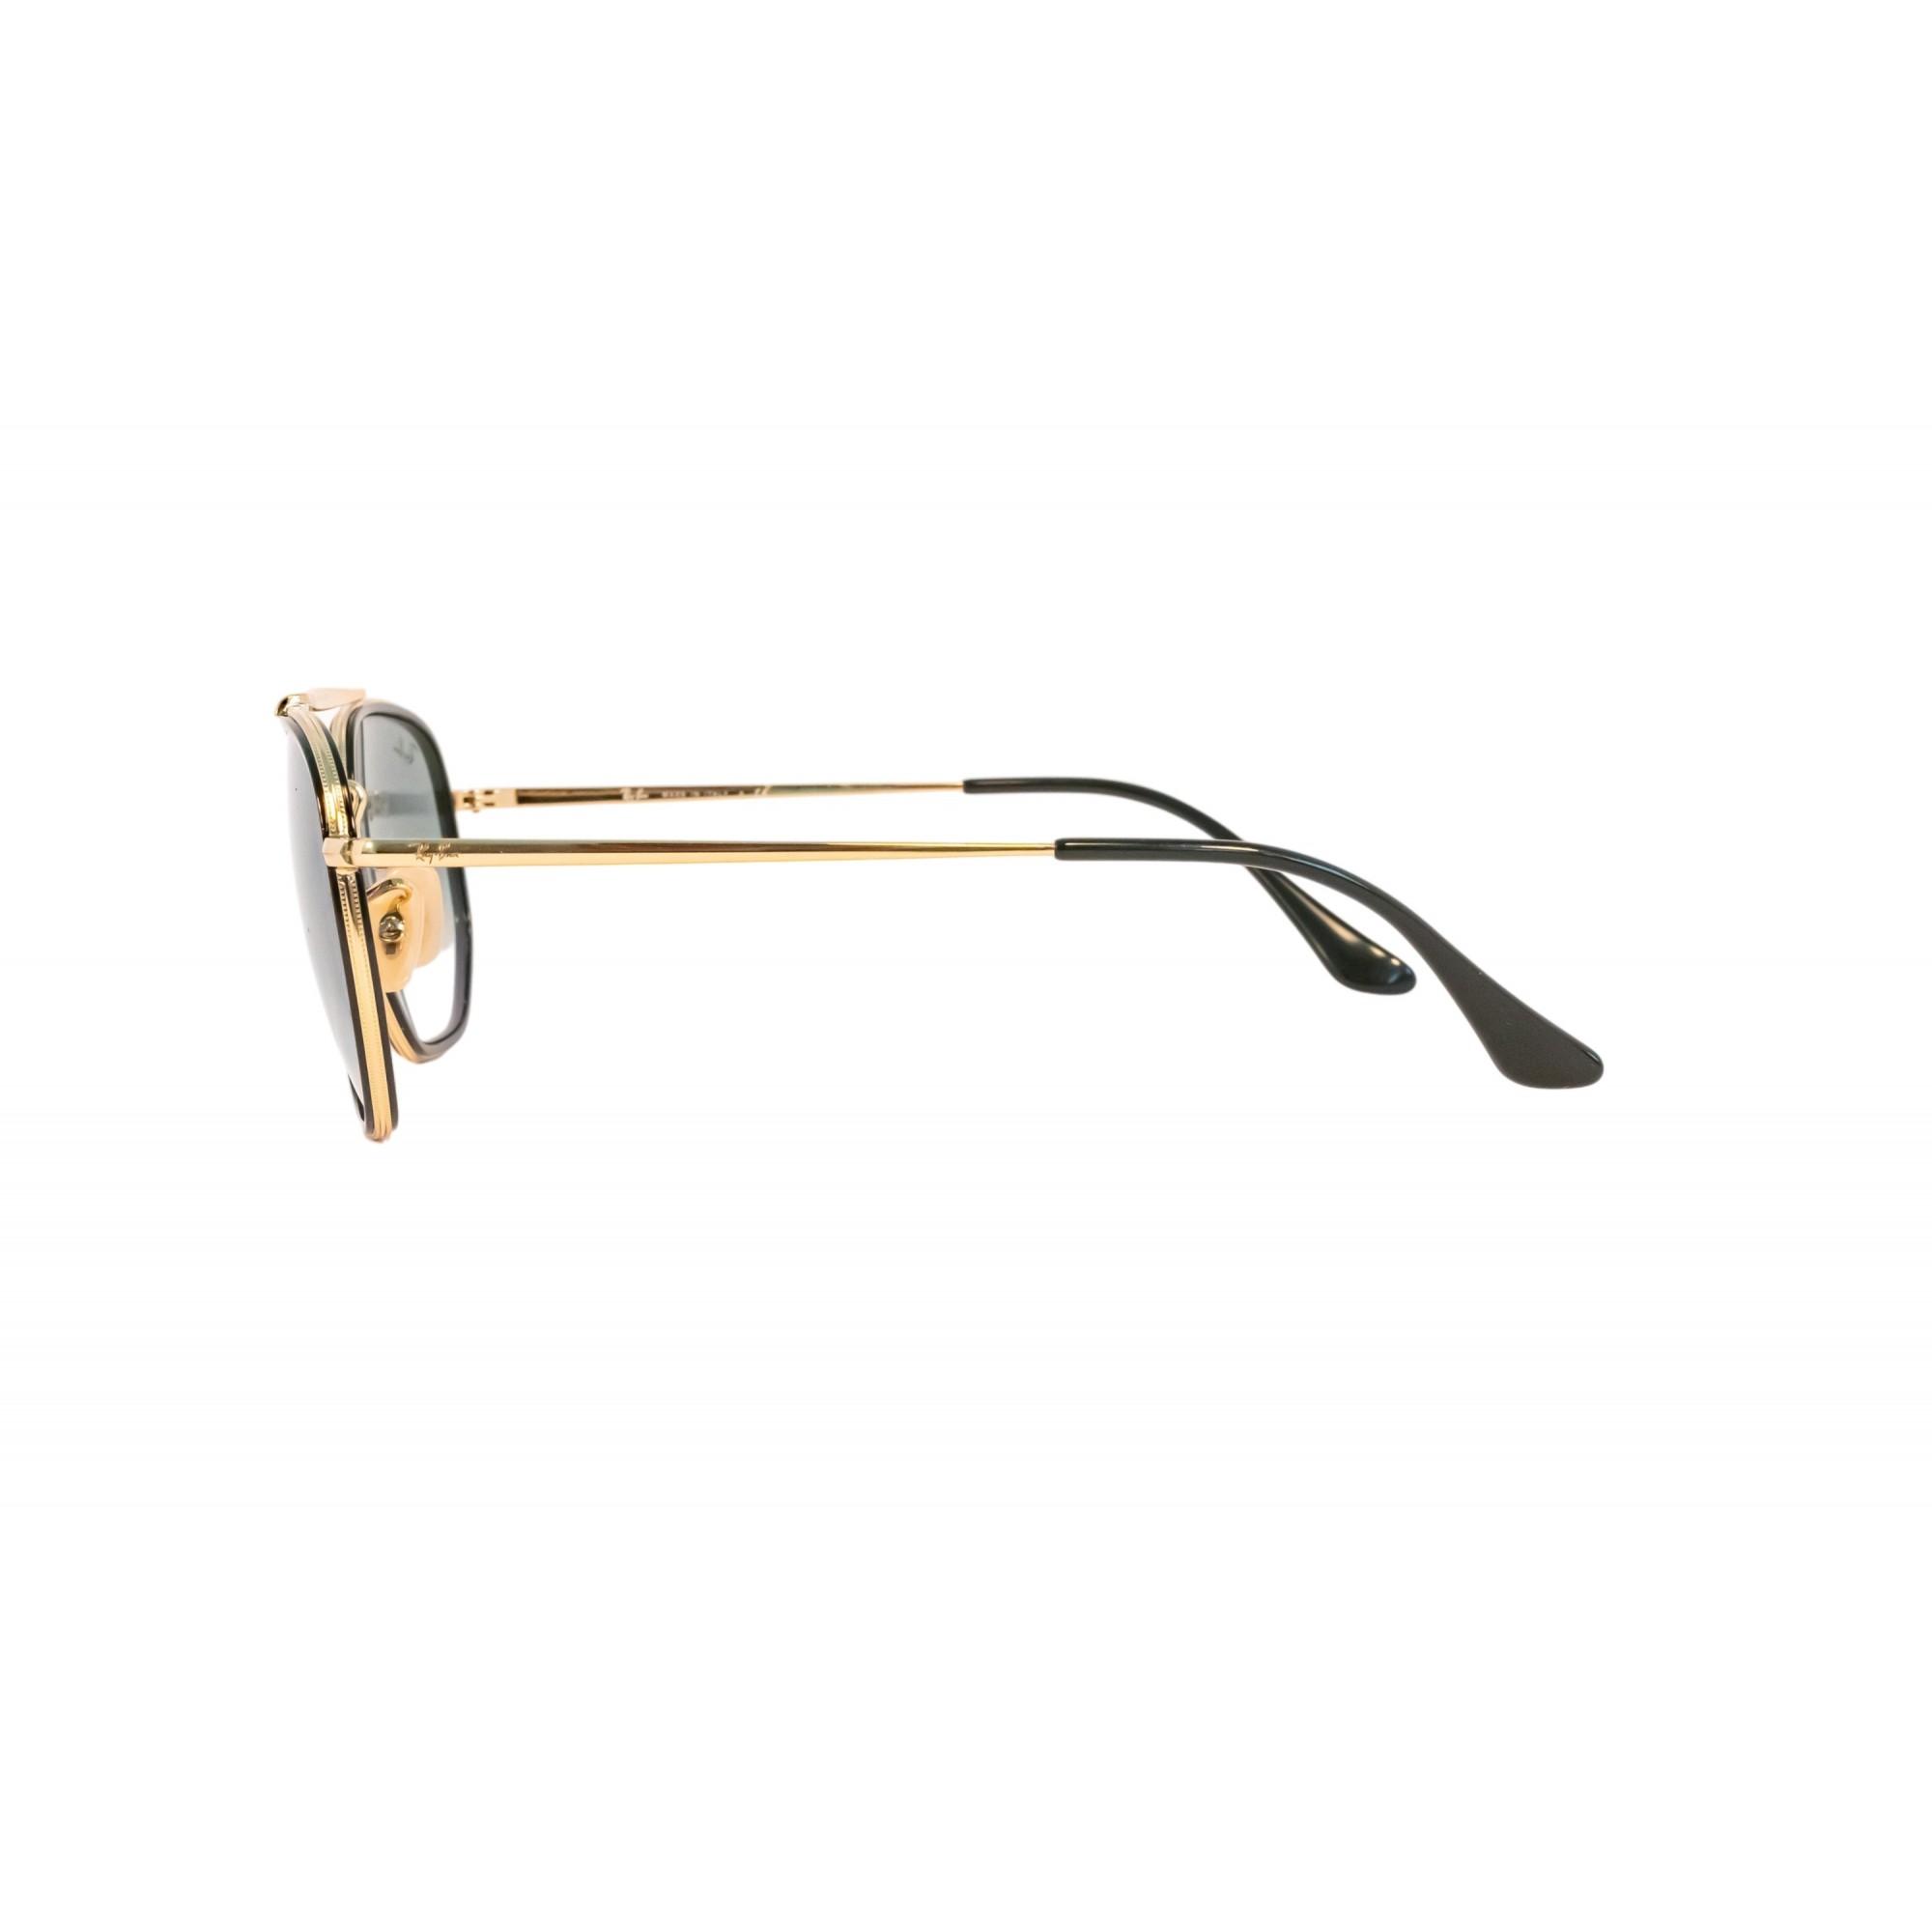 Óculos Ray Ban Marshal Ii Rb3648m 91673f 52 Dourado